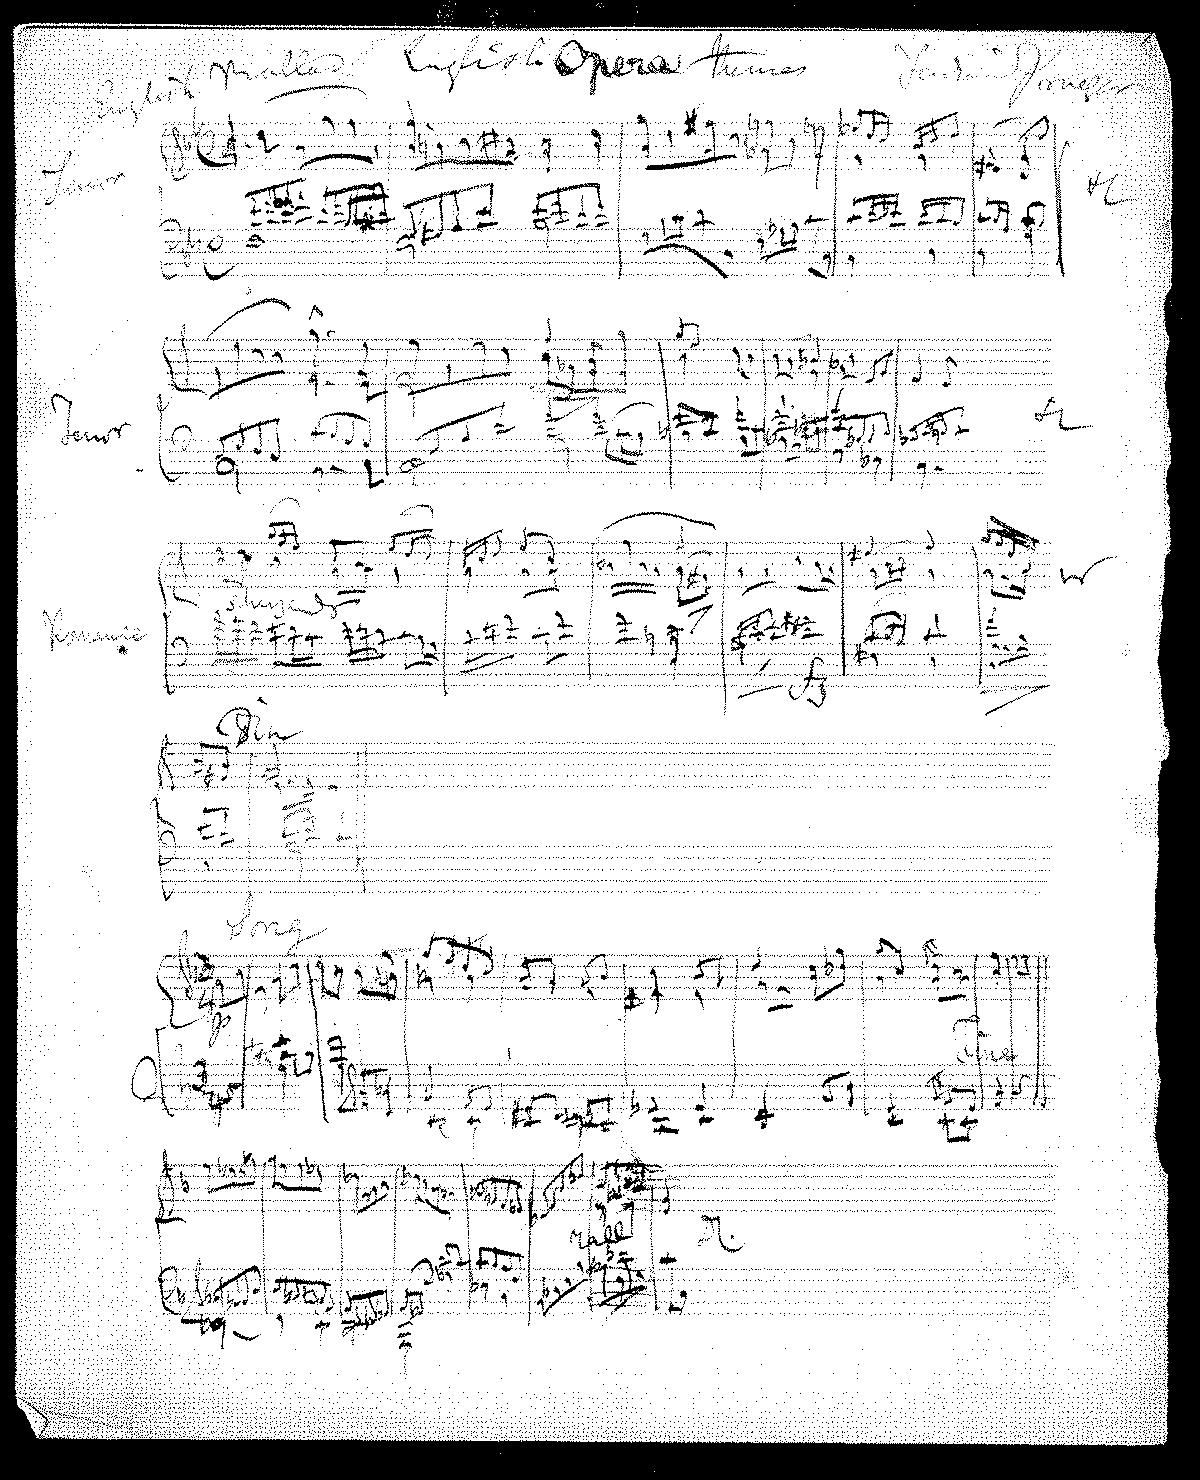 English Opera Themes (Praeger, Ferdinand) - IMSLP: Free